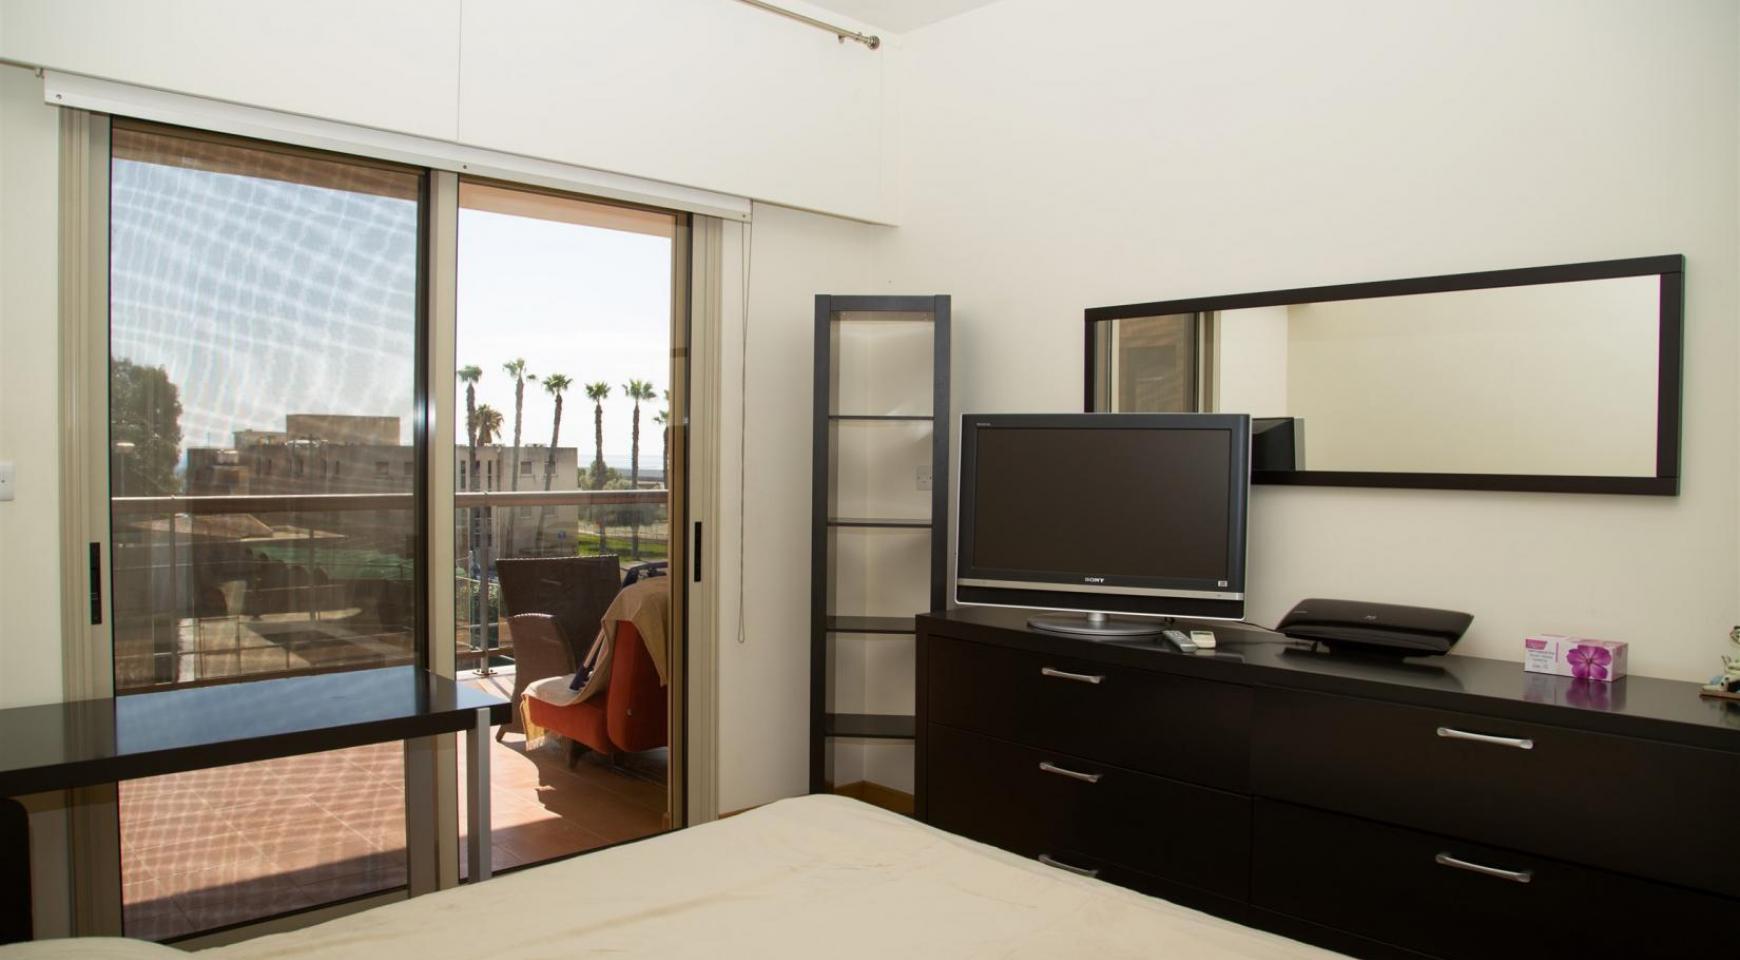 Luxury 3 Bedroom Apartment in Enaerios Area near the Sea - 7